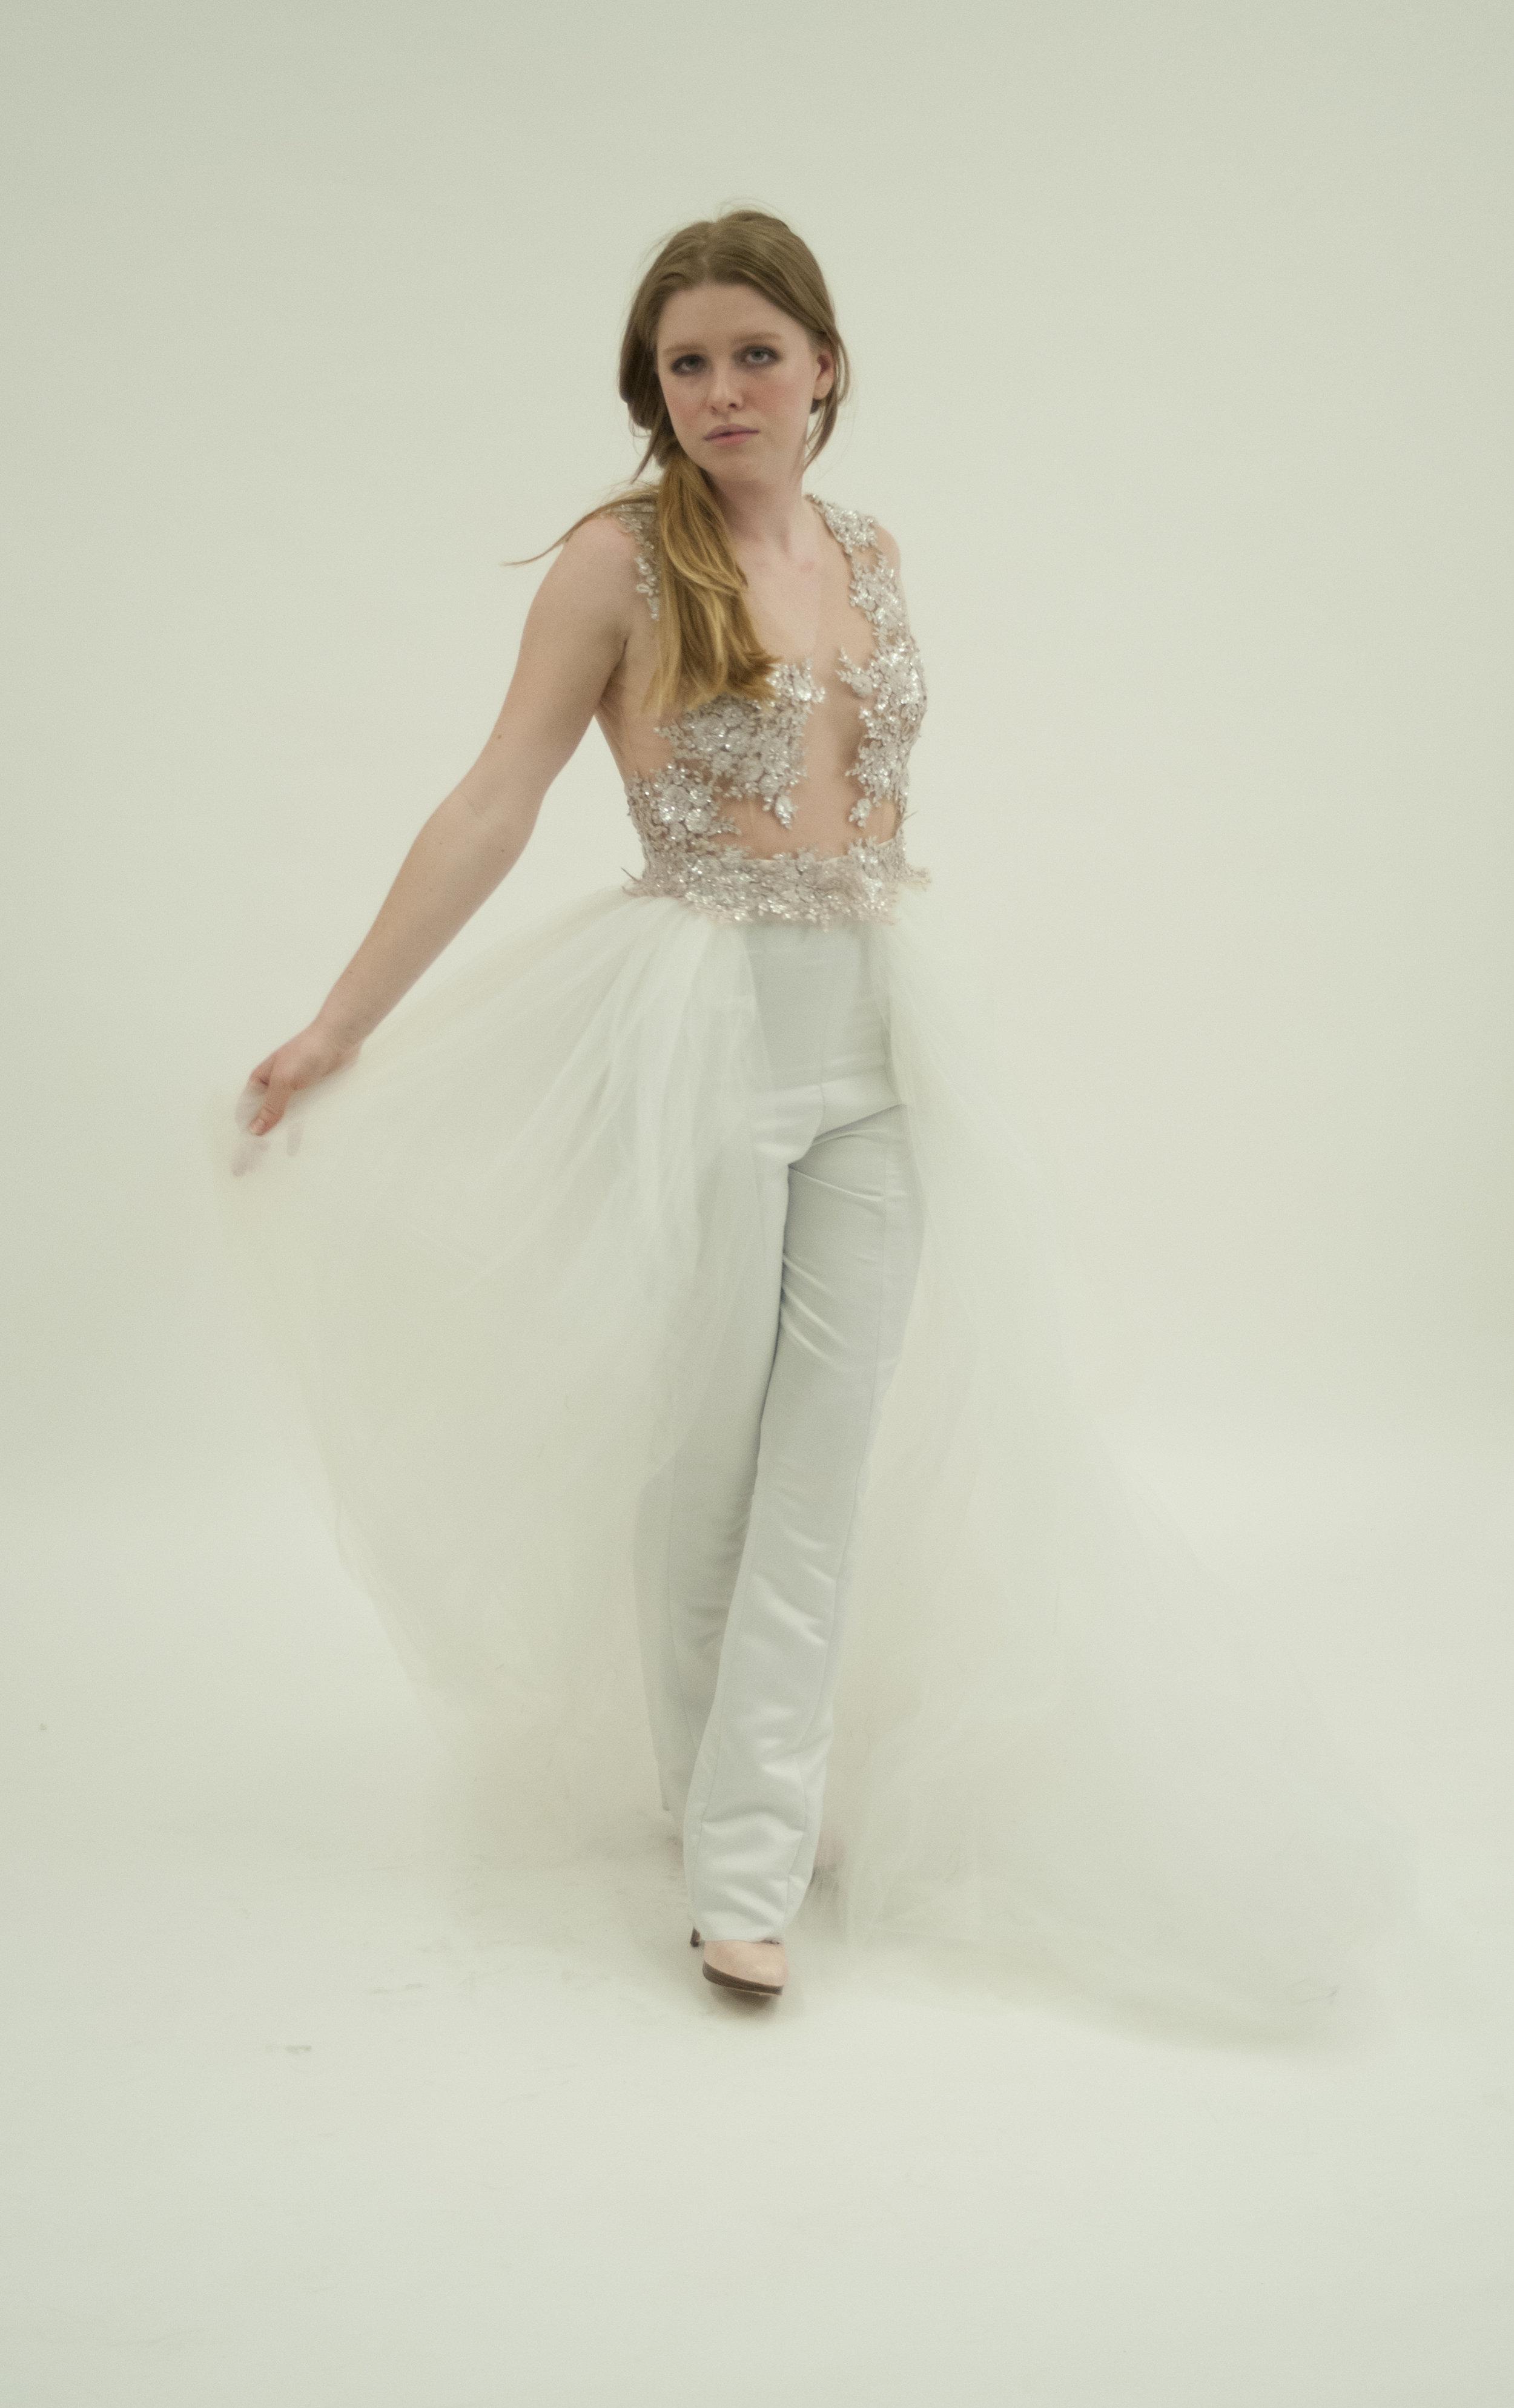 FashionPhotoshoot_042018_0653.jpg